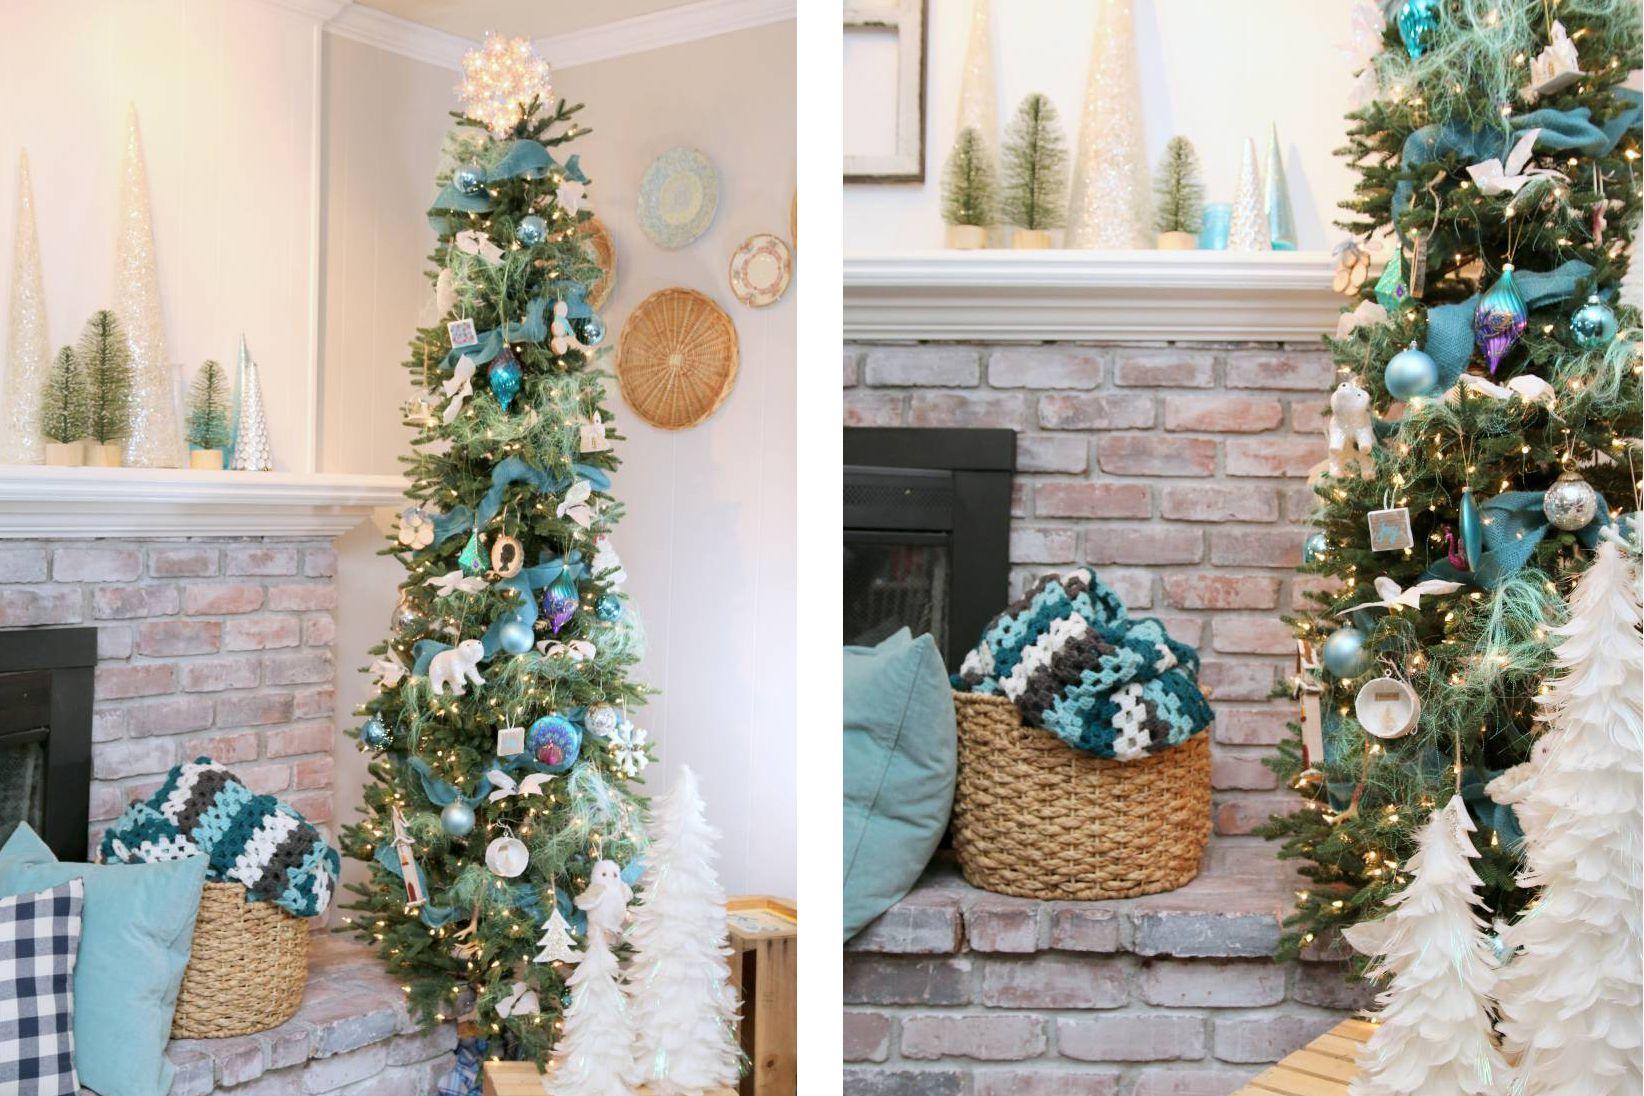 33 festive fresh ways to decorate your christmas tree - Aqua Christmas Tree